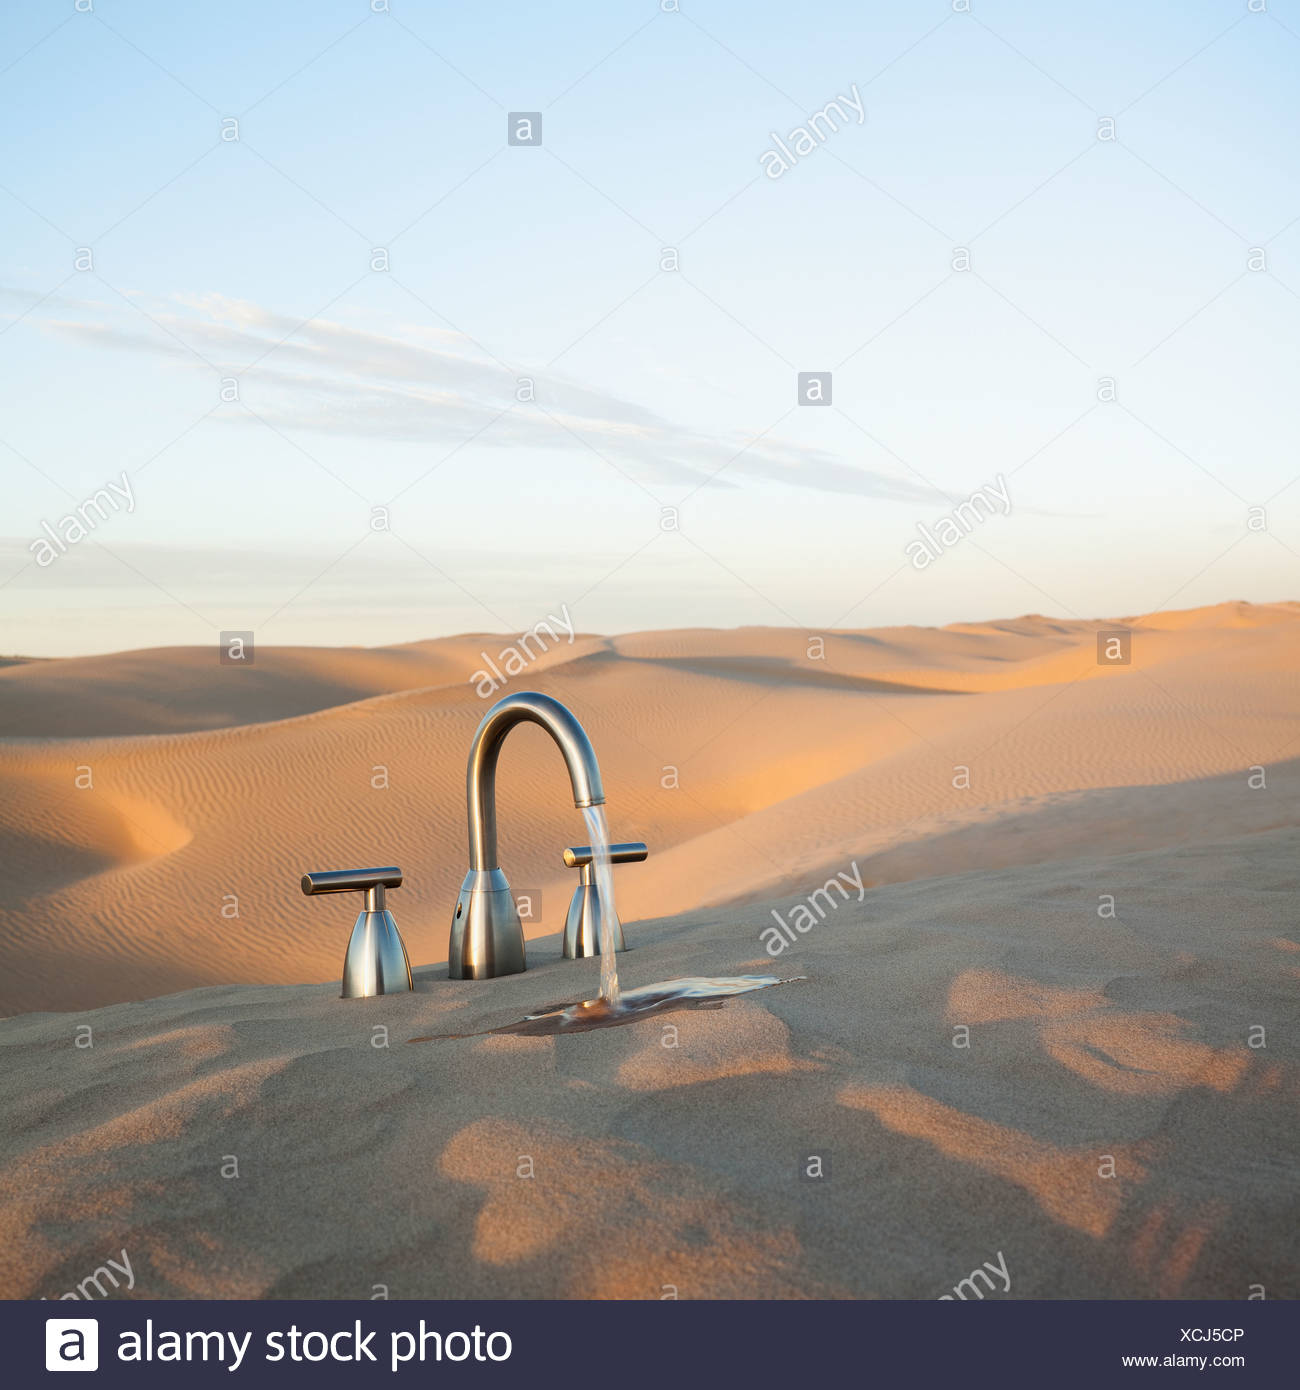 Faucet in desert - Stock Image